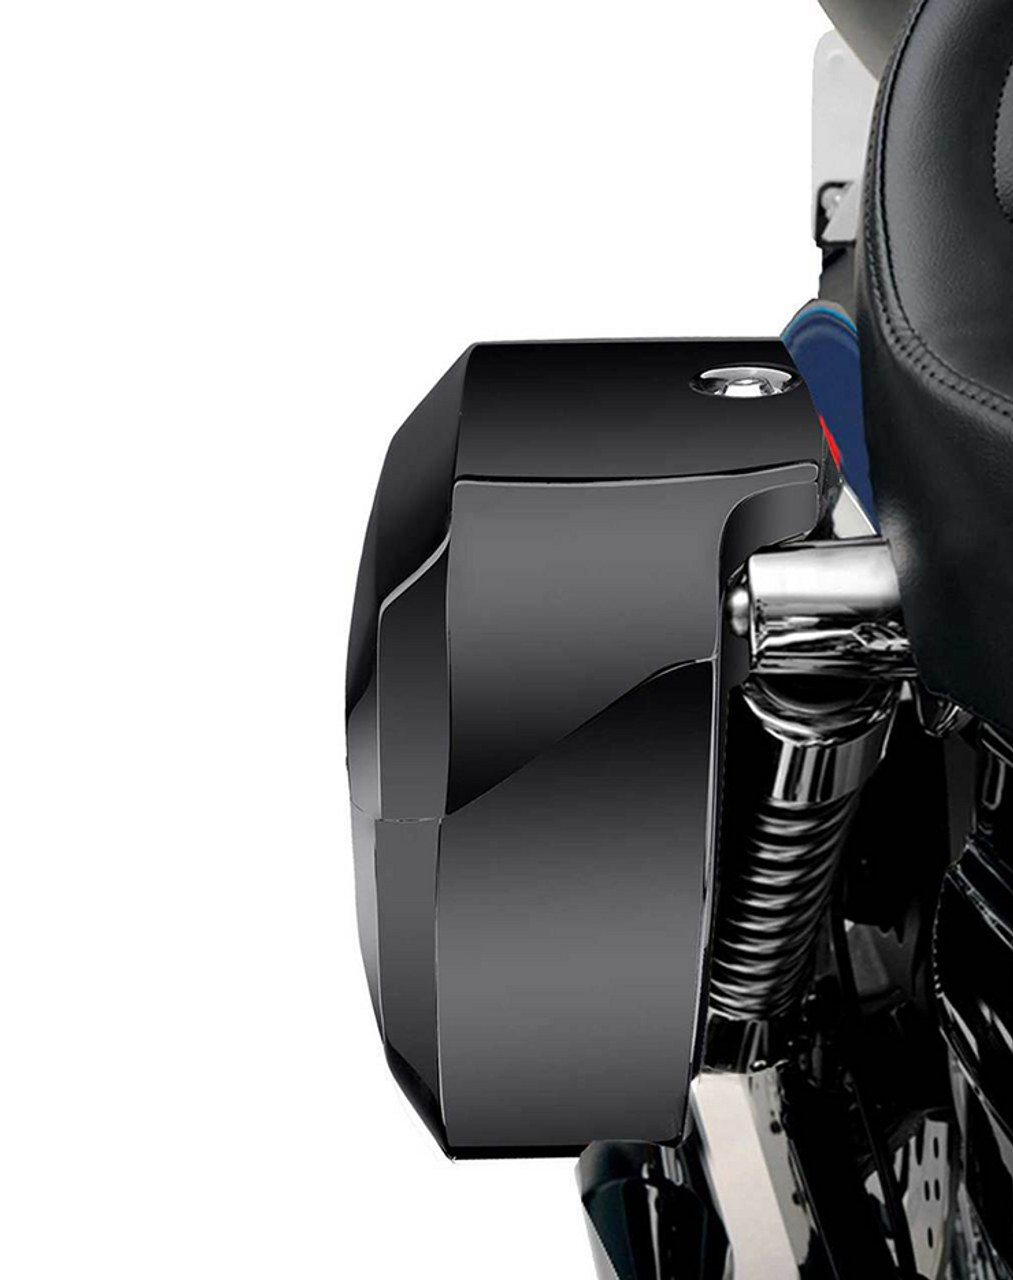 Honda VTX 1800 S Viking Lamellar Large Spear Shock Cutout Hard Saddlebags shock cutout view